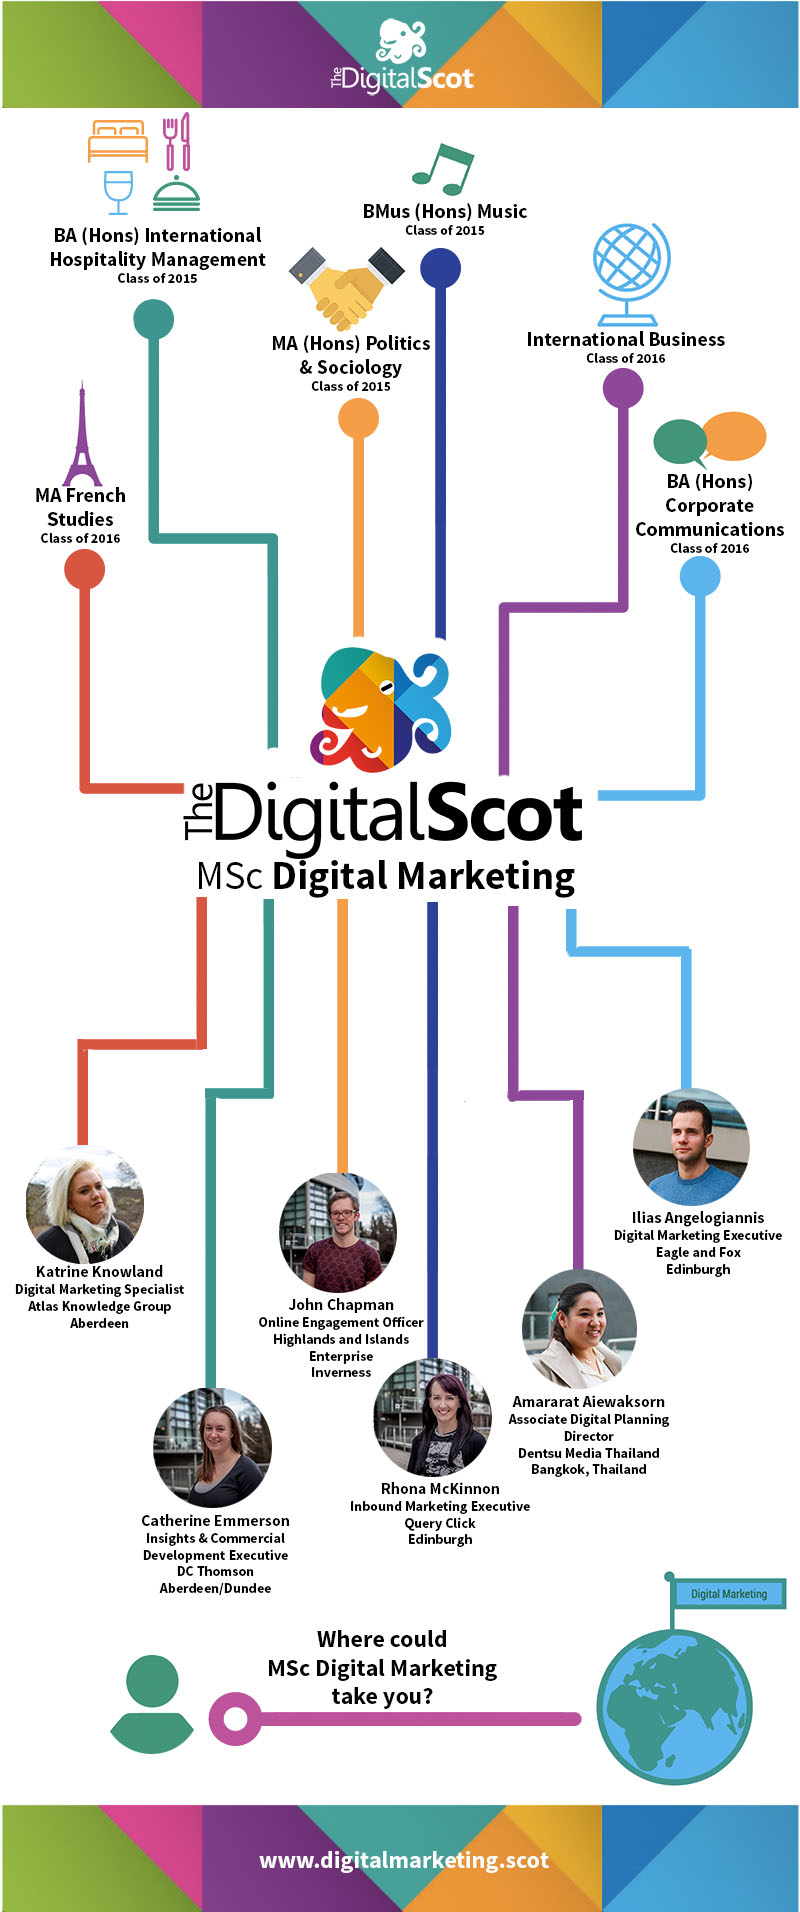 MSc Digital Marketing Graduates - Where Are They Now?